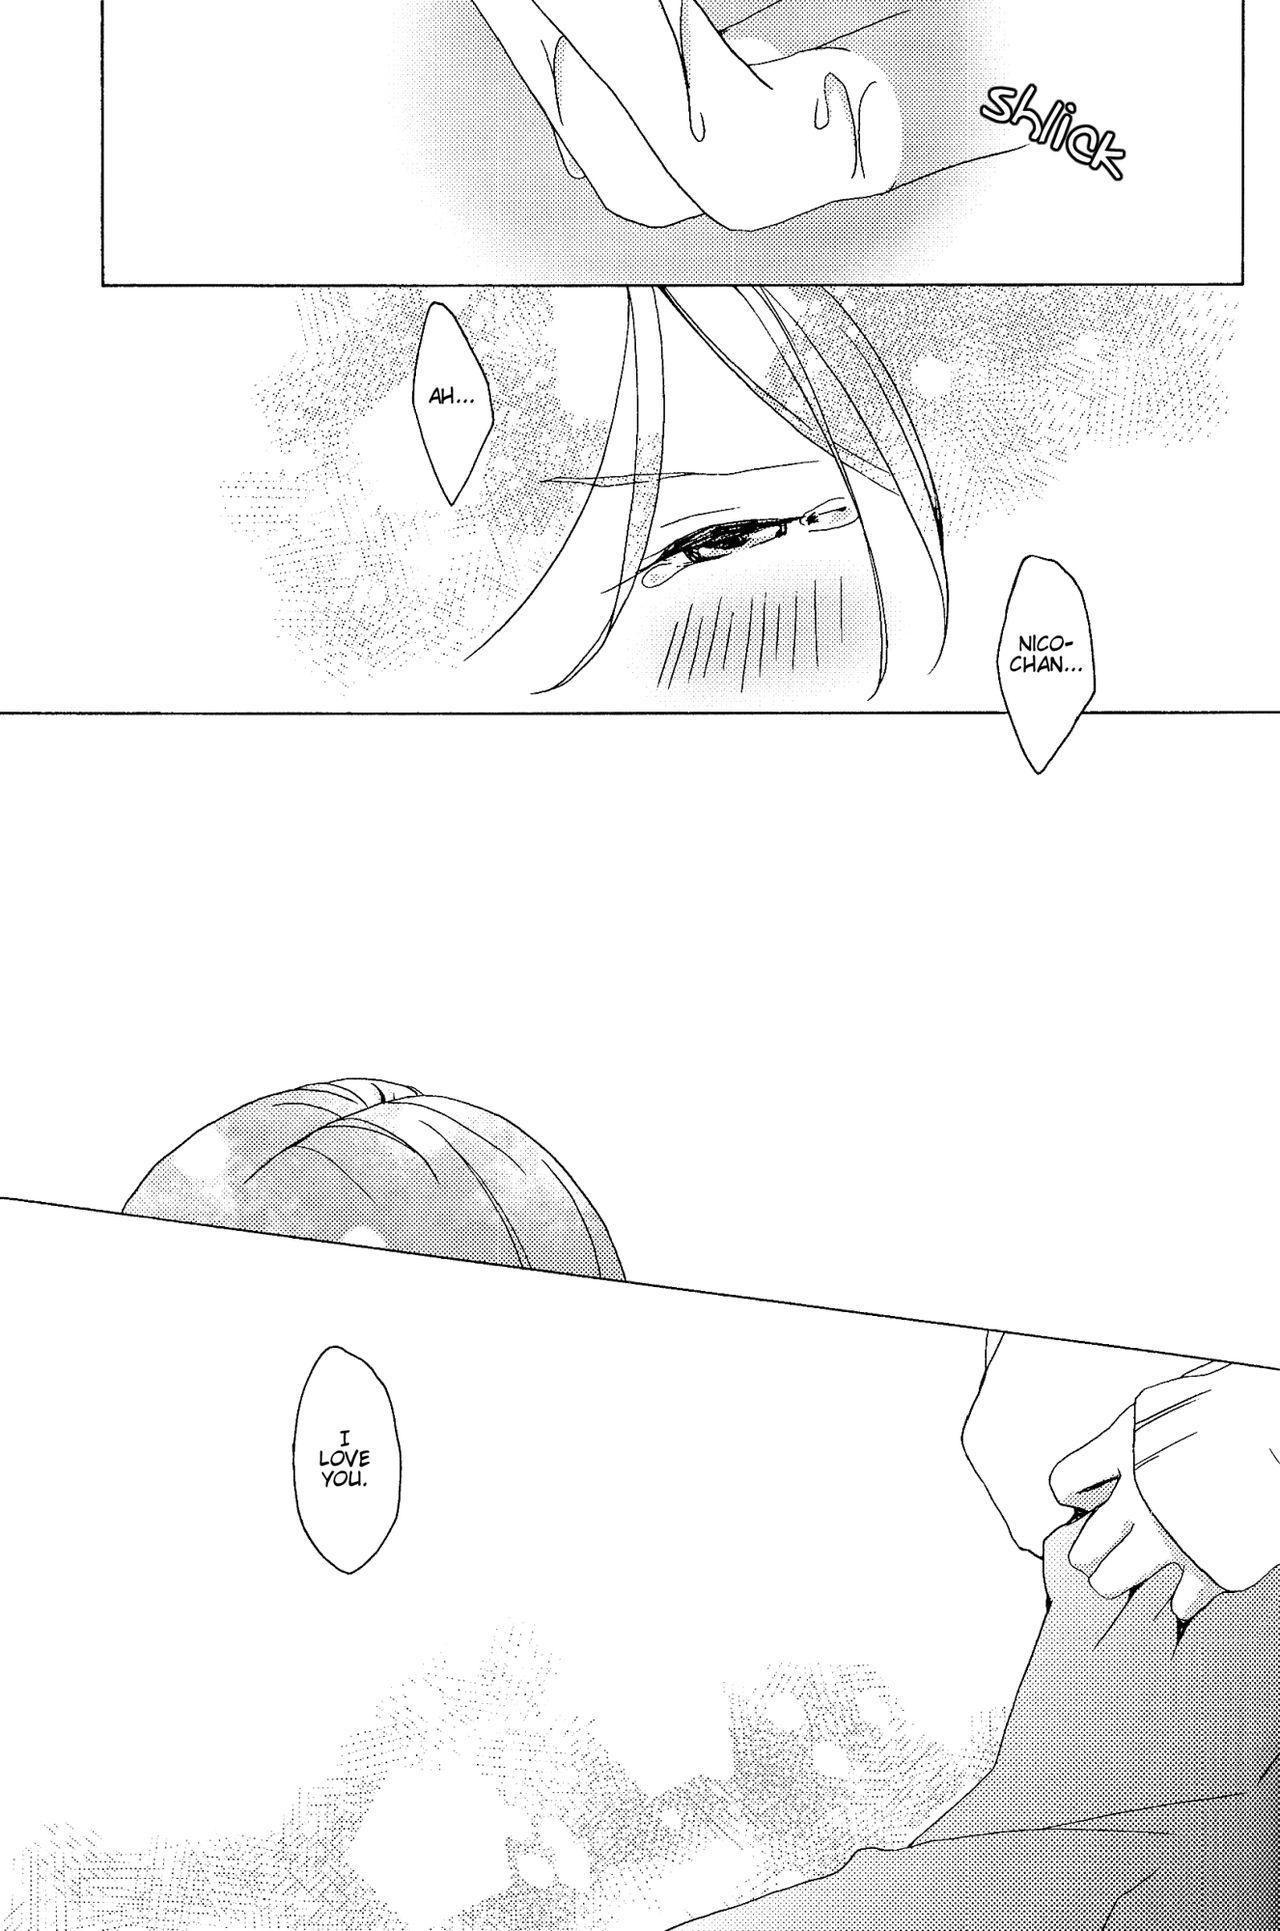 (Bokura no Love Live! 10) [Labo (Various)] Maki-chan Aisare aiueo!   Maki-chan Loved Alphabetically! (Love Live!) [English] {/u/ scanlations} [Incomplete] 14